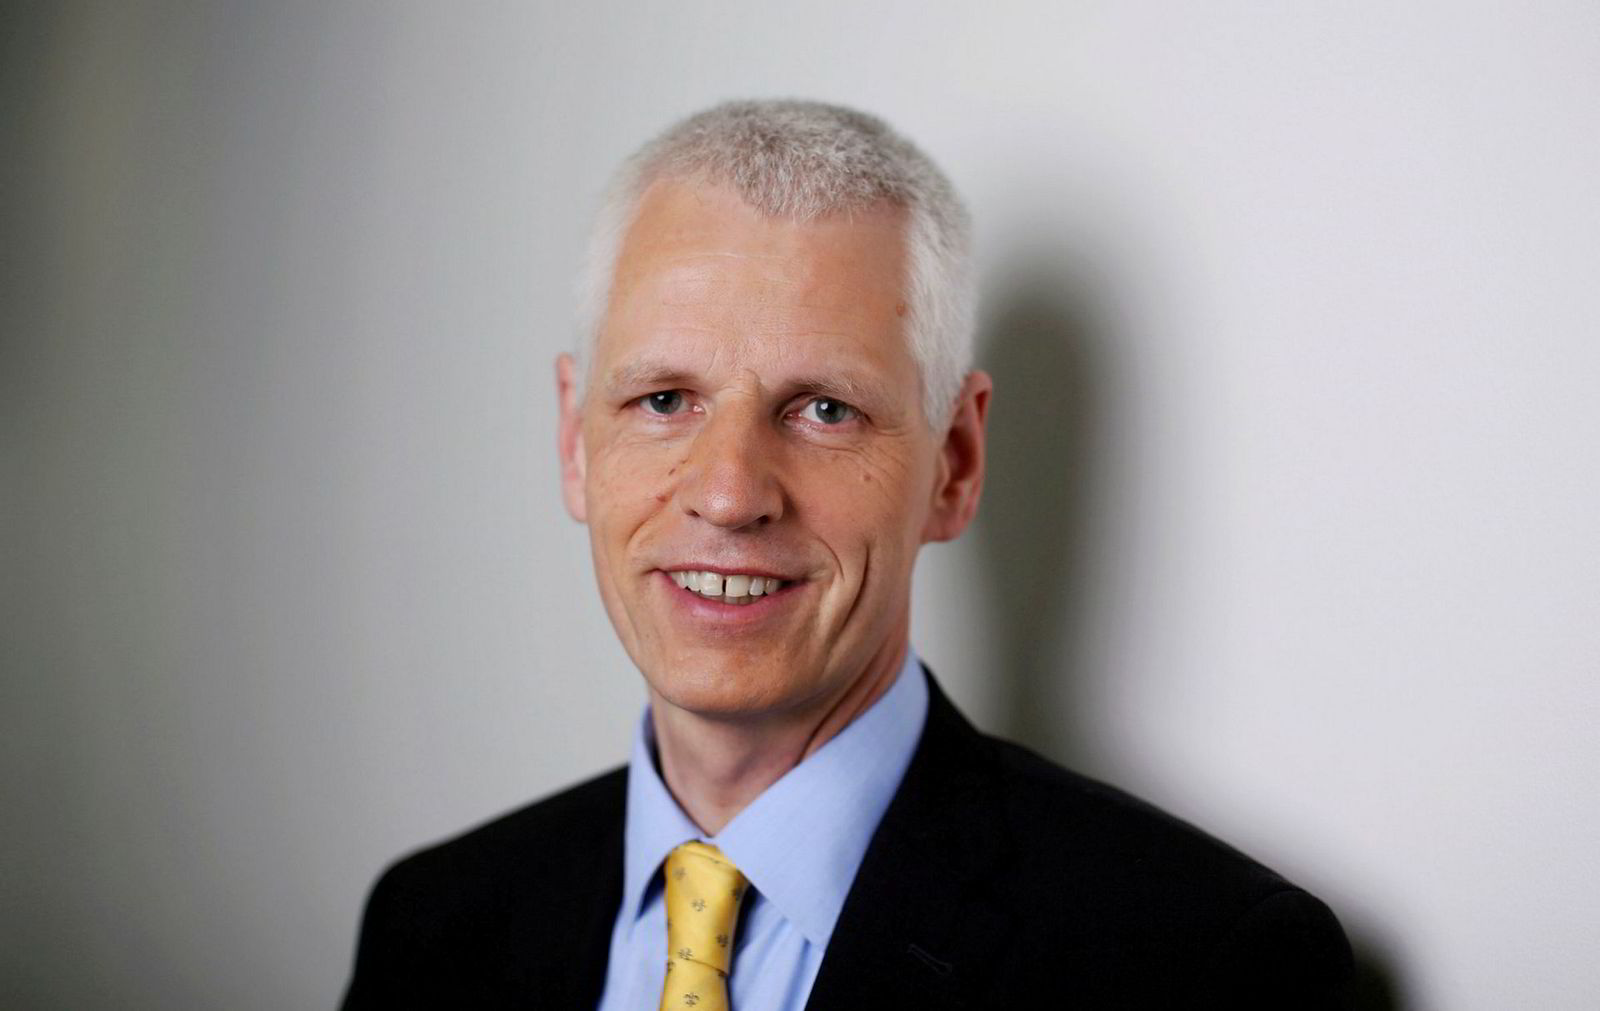 Holger Schmieding, sjeføkonom i Berenberg Bank.